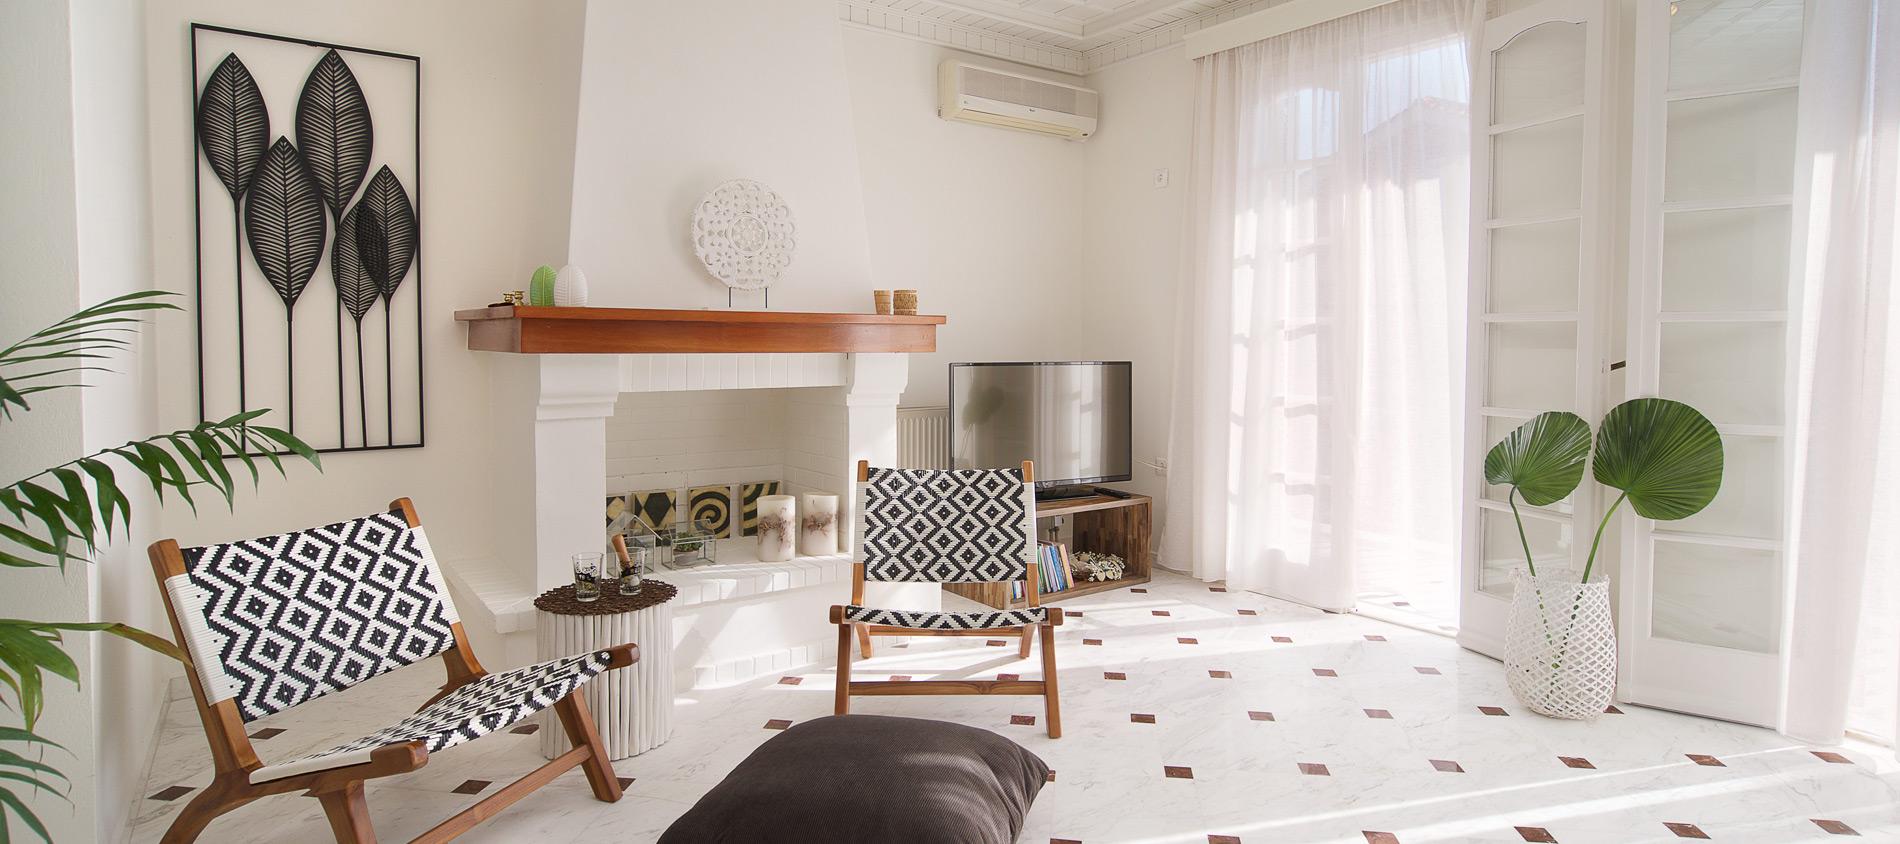 kefalonia_holiday_apartments_03